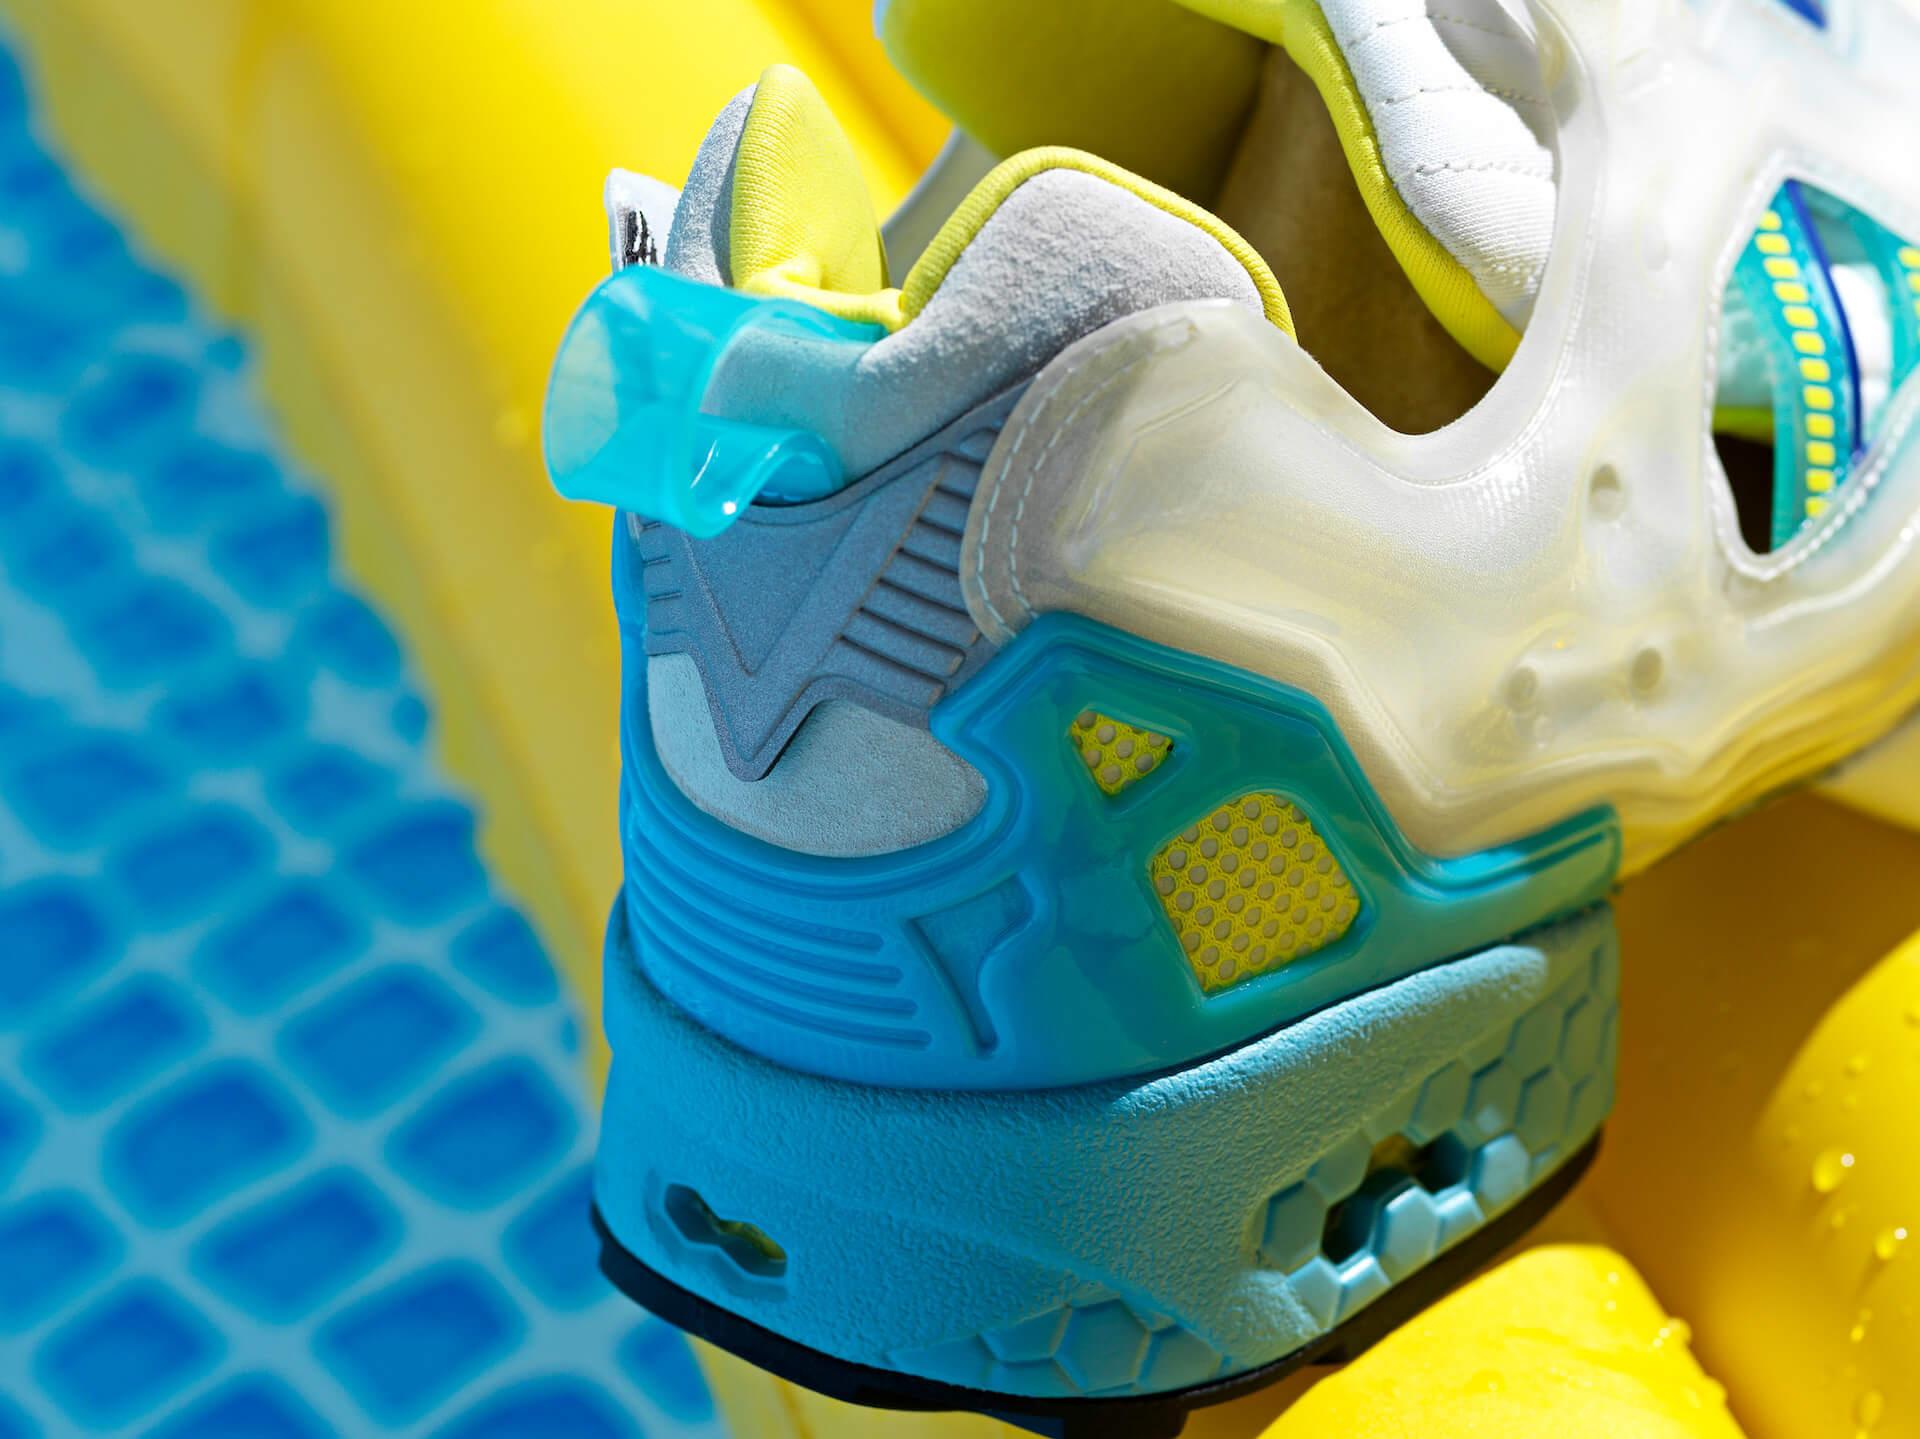 adidas OriginalsとReebokのコラボモデル「ZX FURY」に夏にぴったりの新色4色が登場! life210719_adidasoriginals_reebok_3